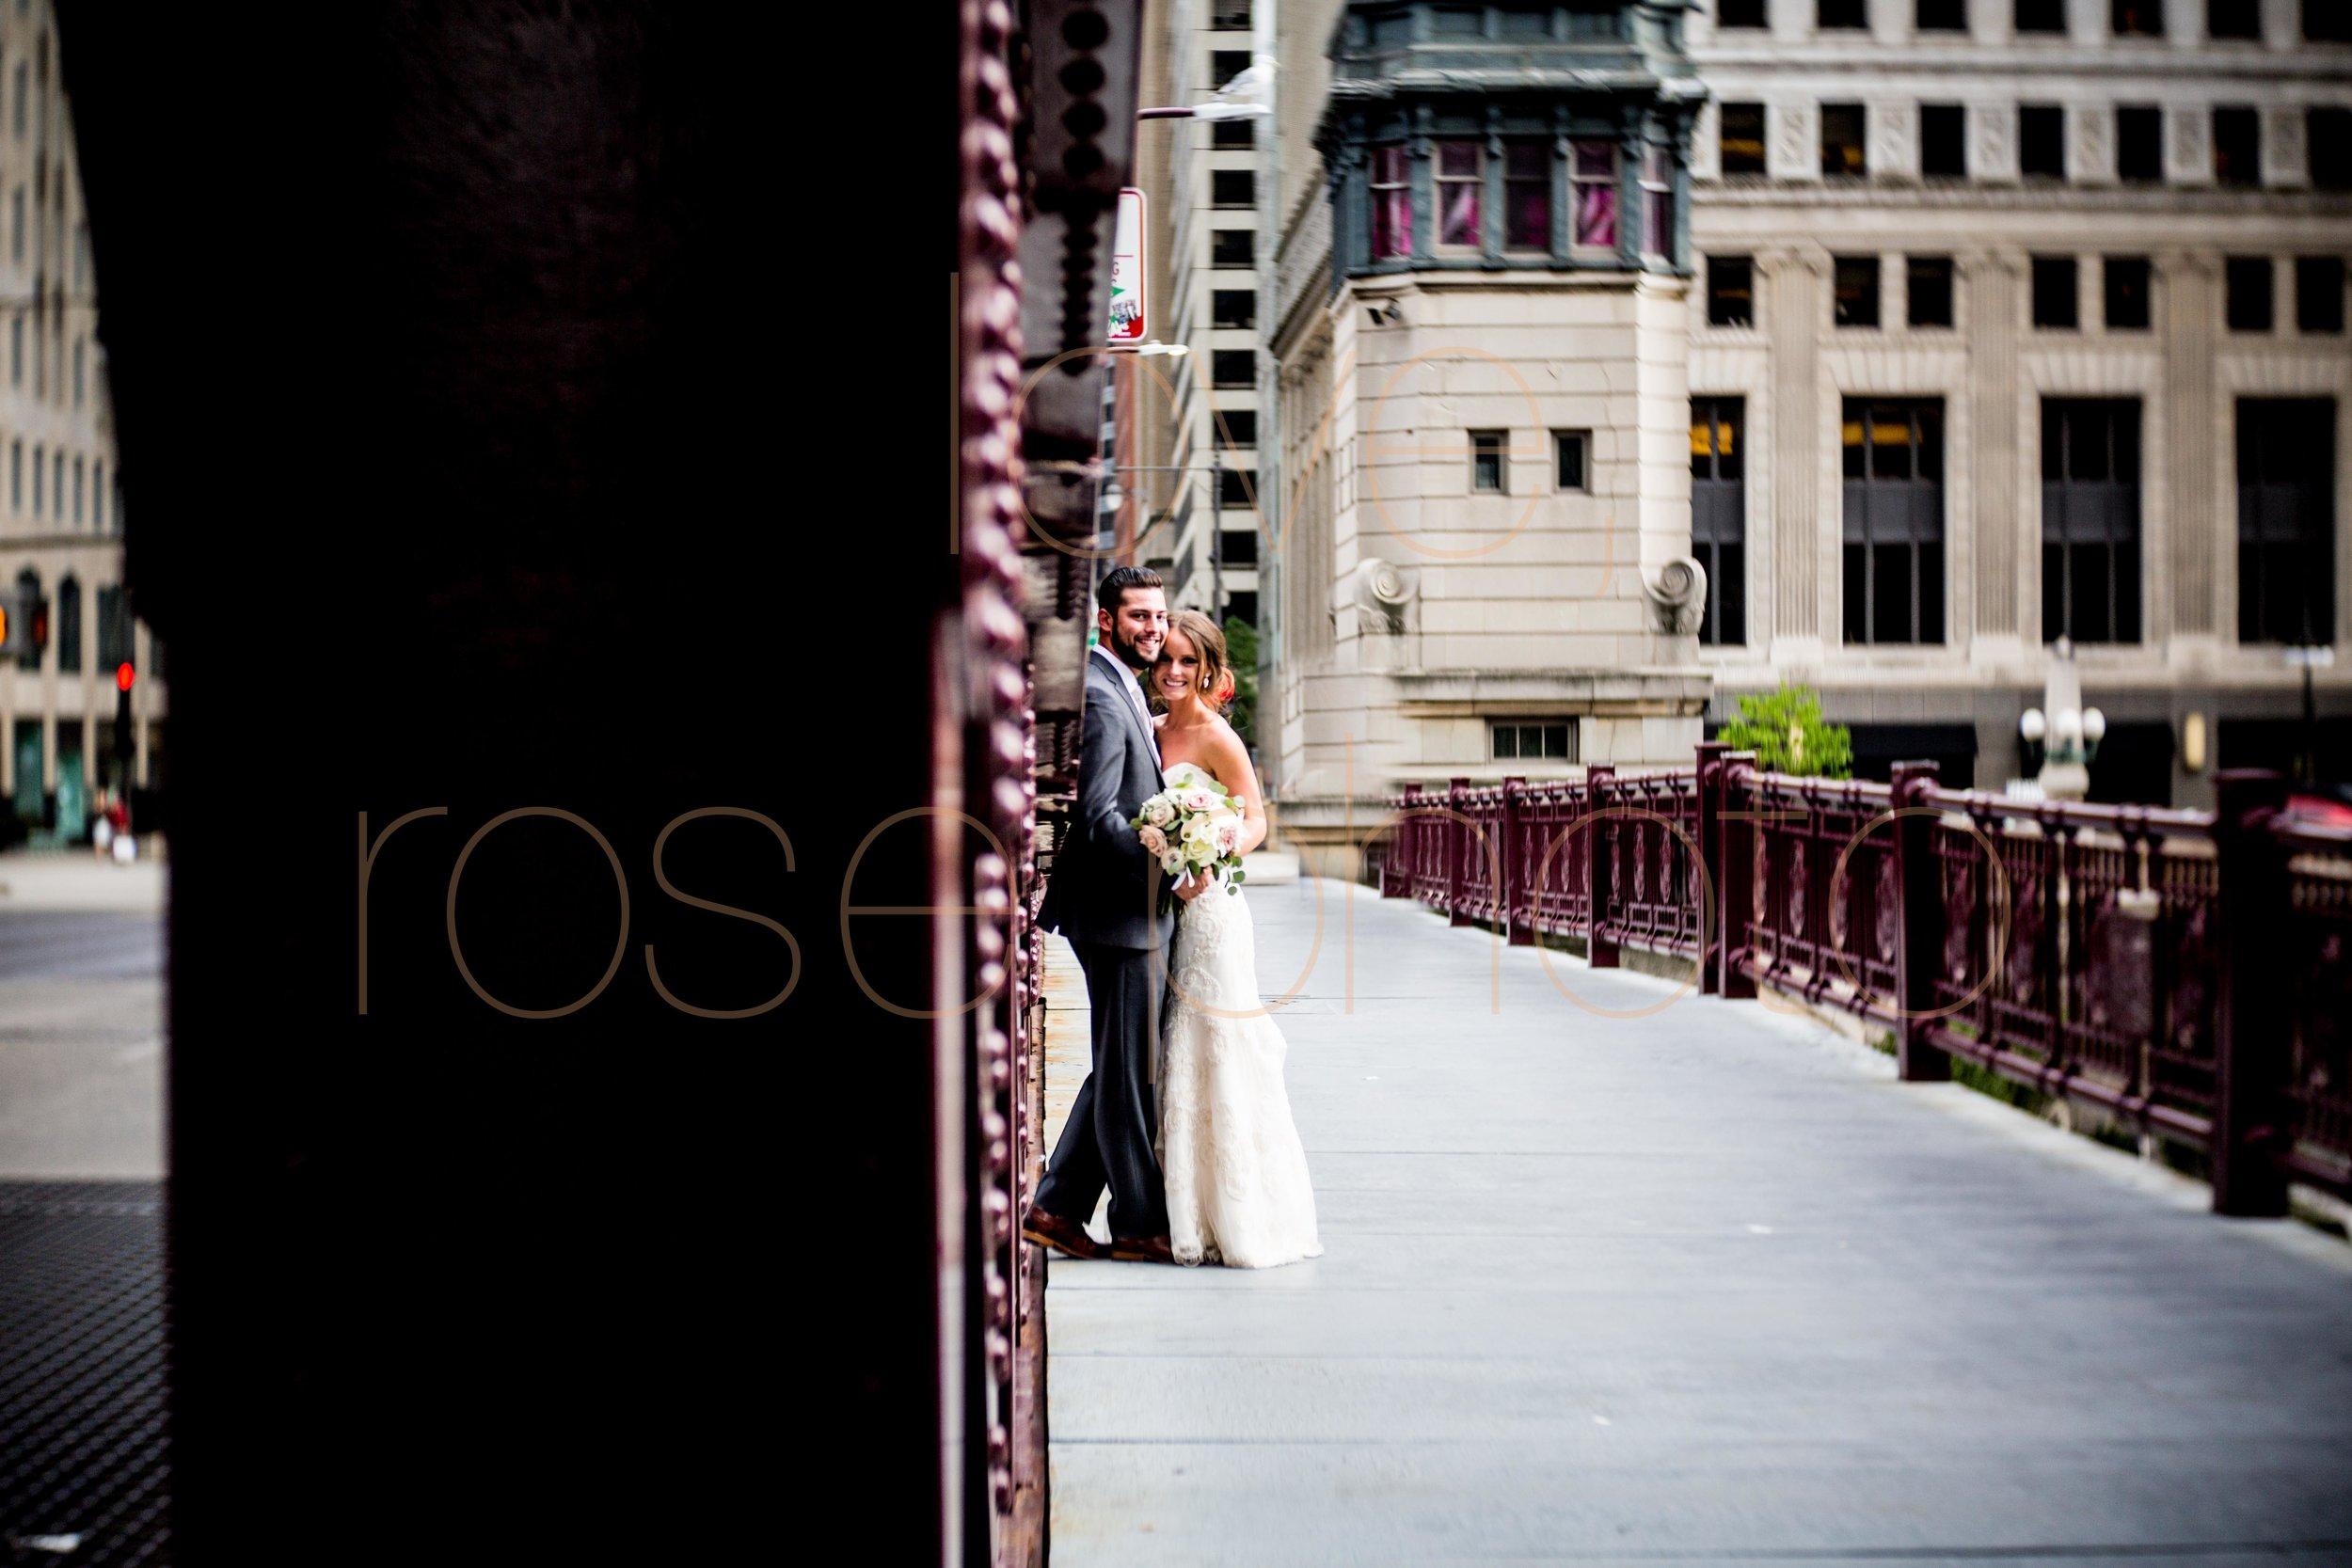 Justine + Matt big day downtown Chicago River Roast wedding by Rose Photo-28.jpg